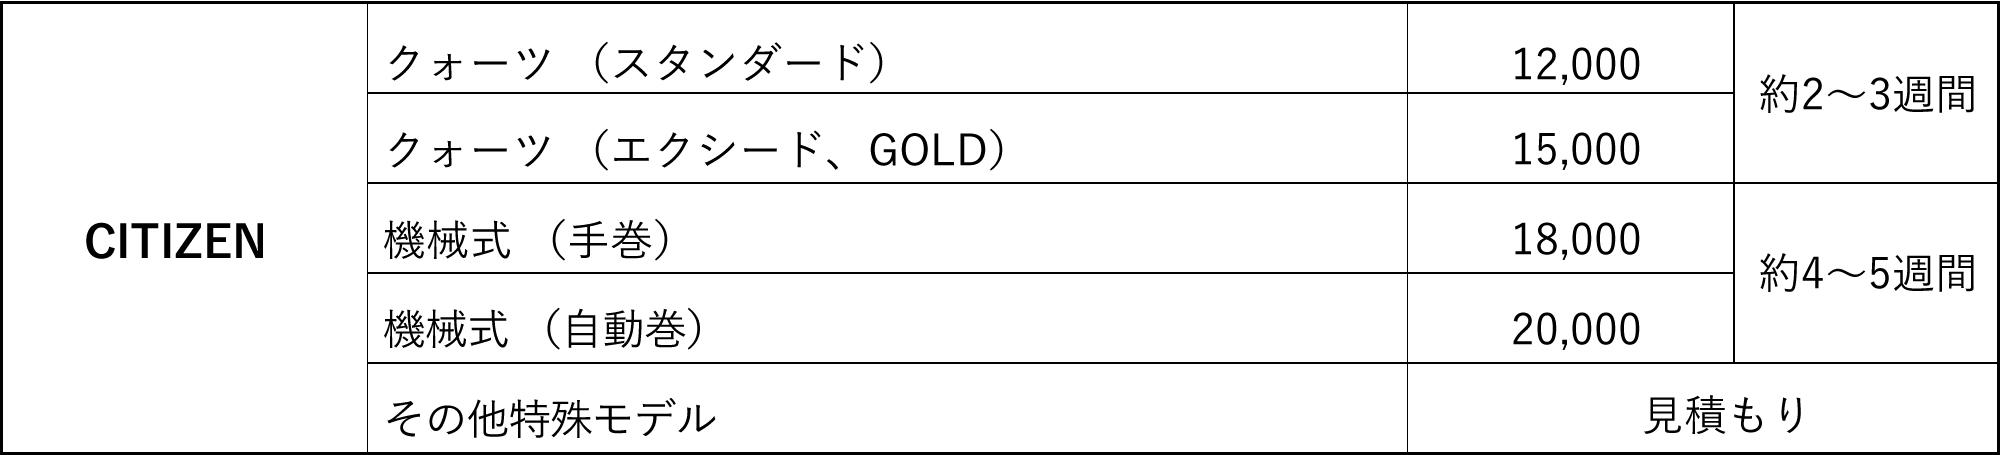 CITIZEN オーバーホール料金表